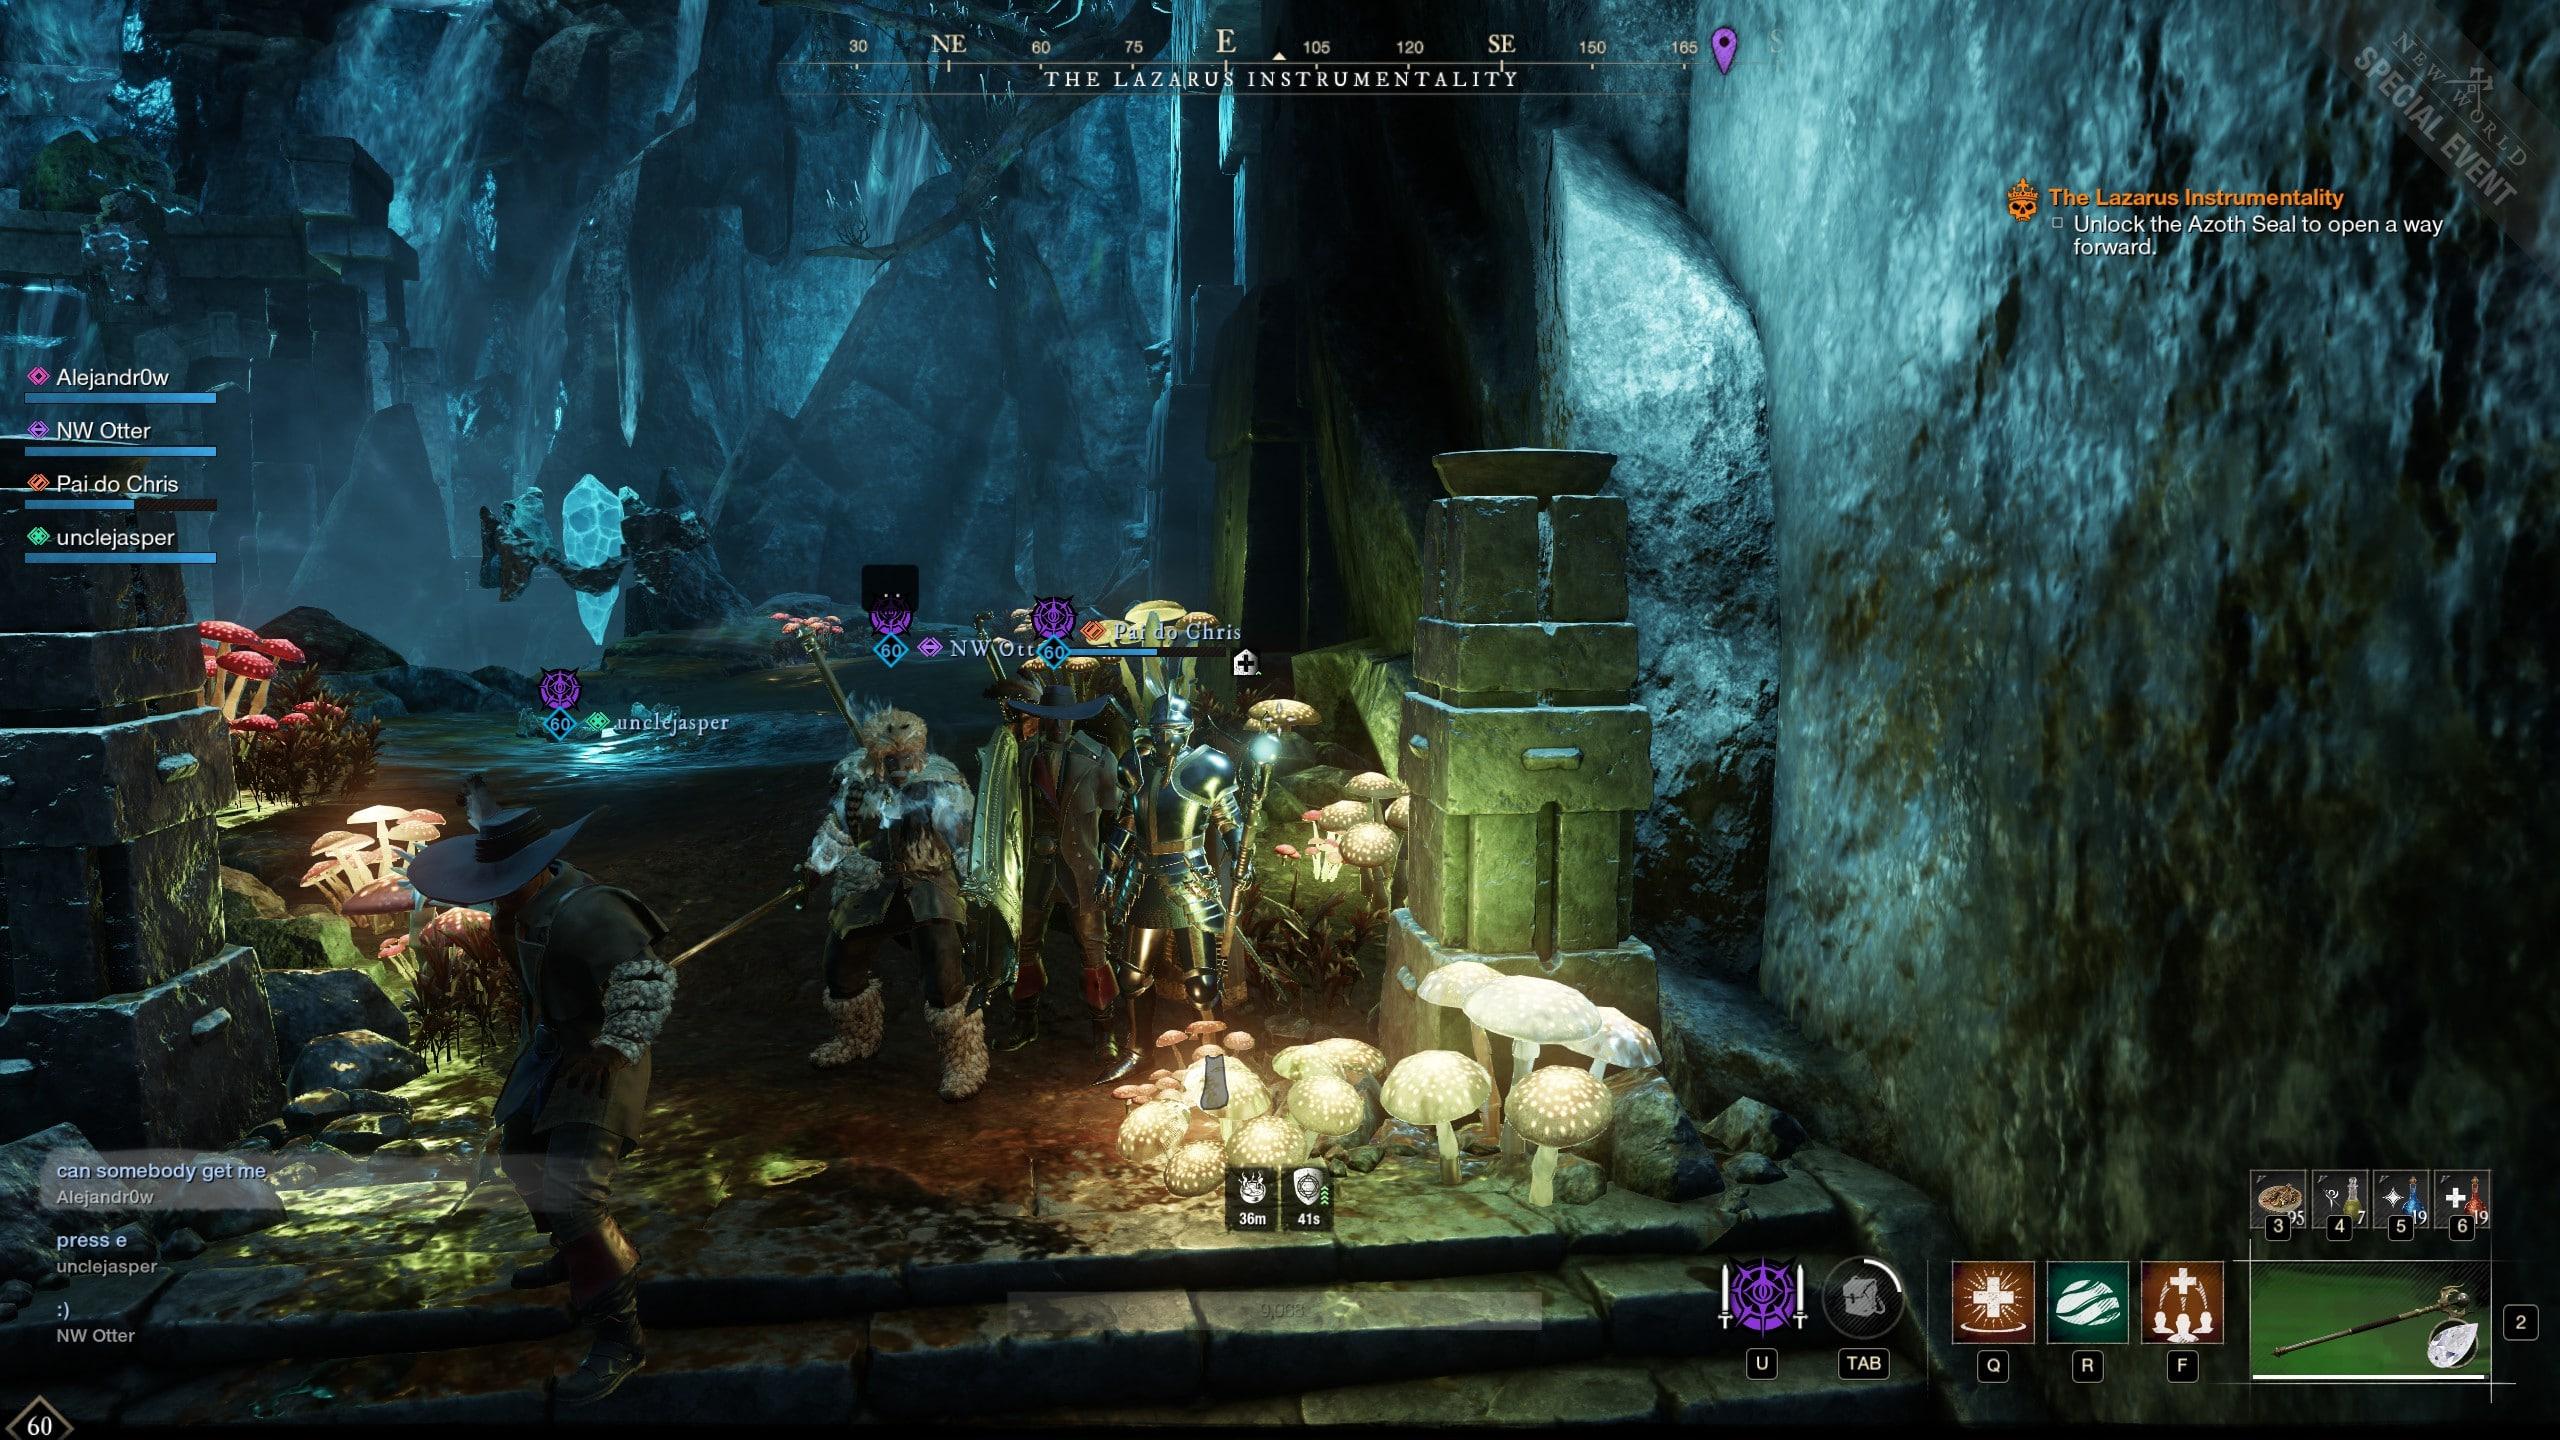 Primeras Impresiones de New World Beta GamersRD